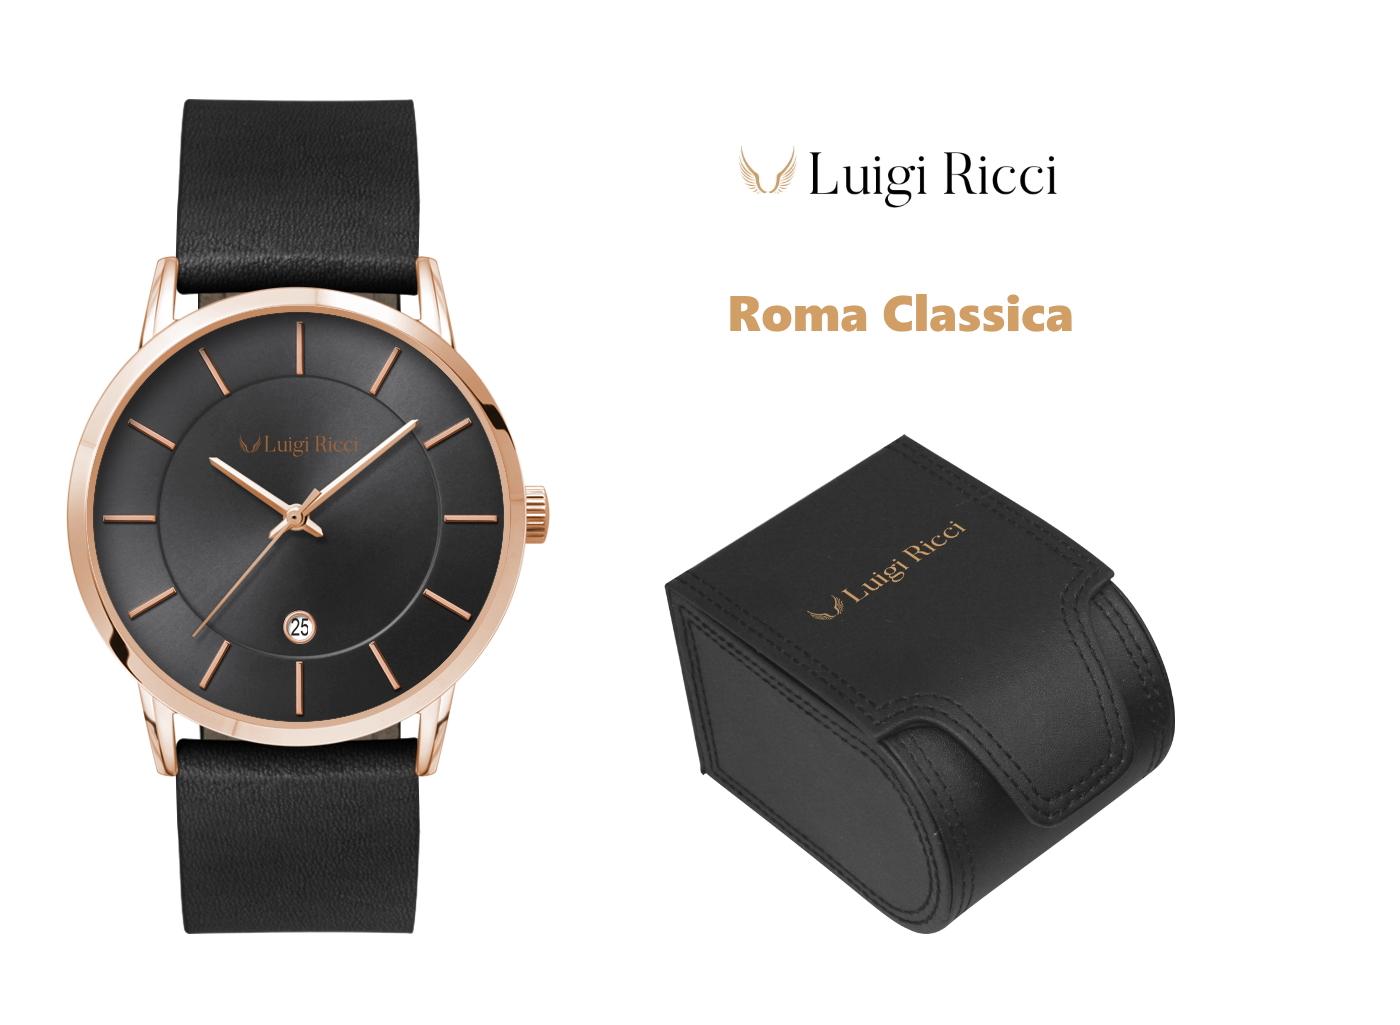 Luigi Ricci Roma Classica